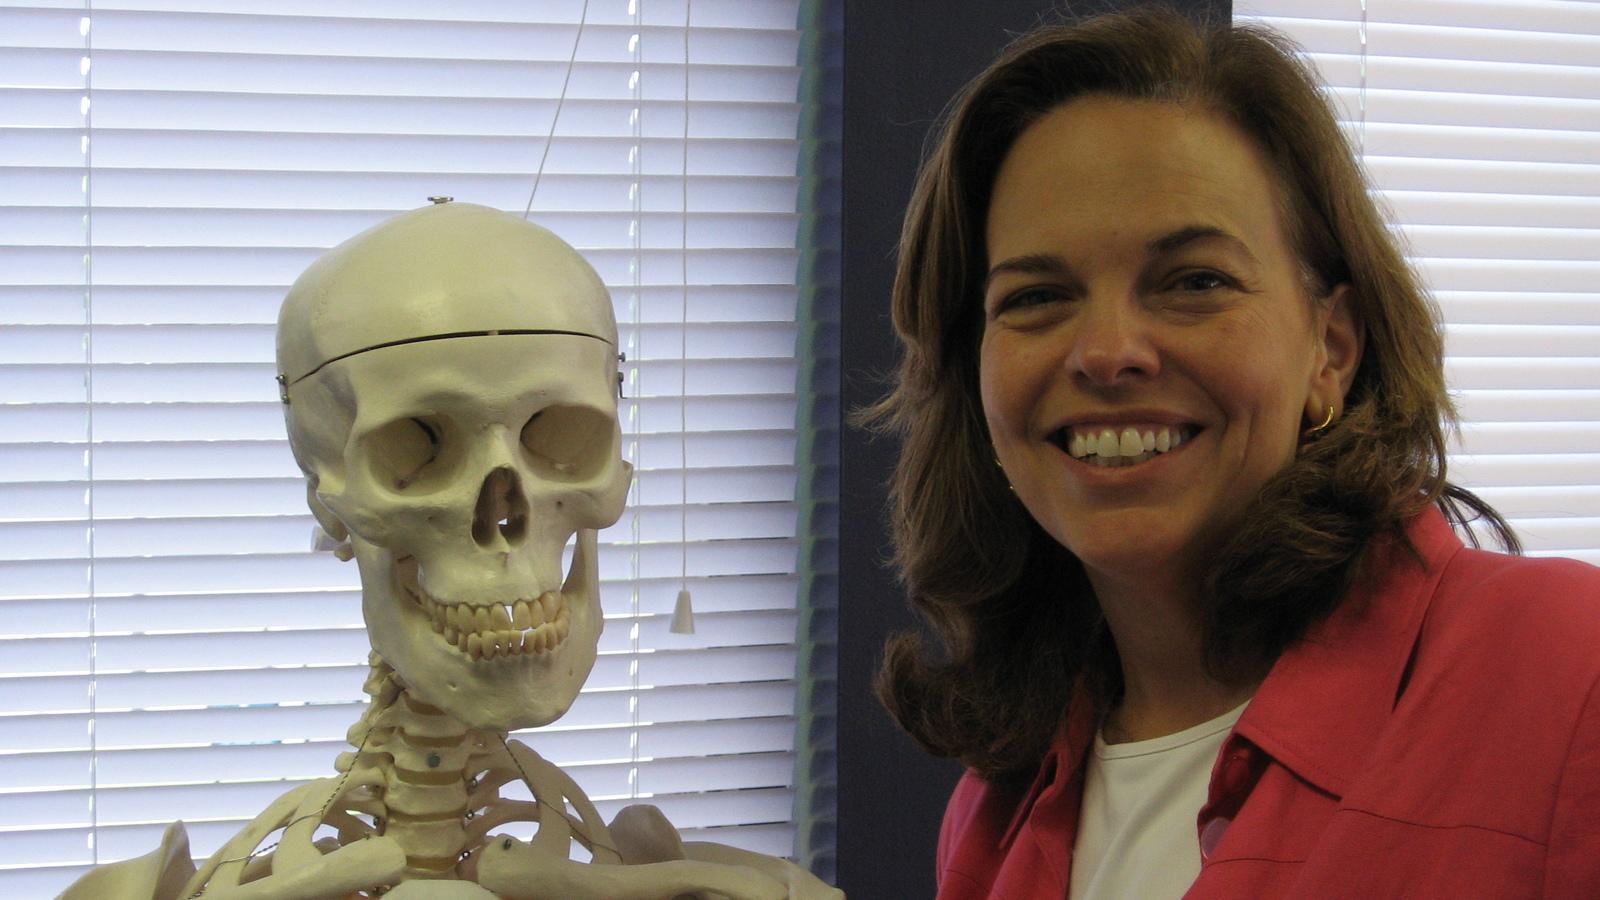 Watch Dr G: Medical Examiner at work!